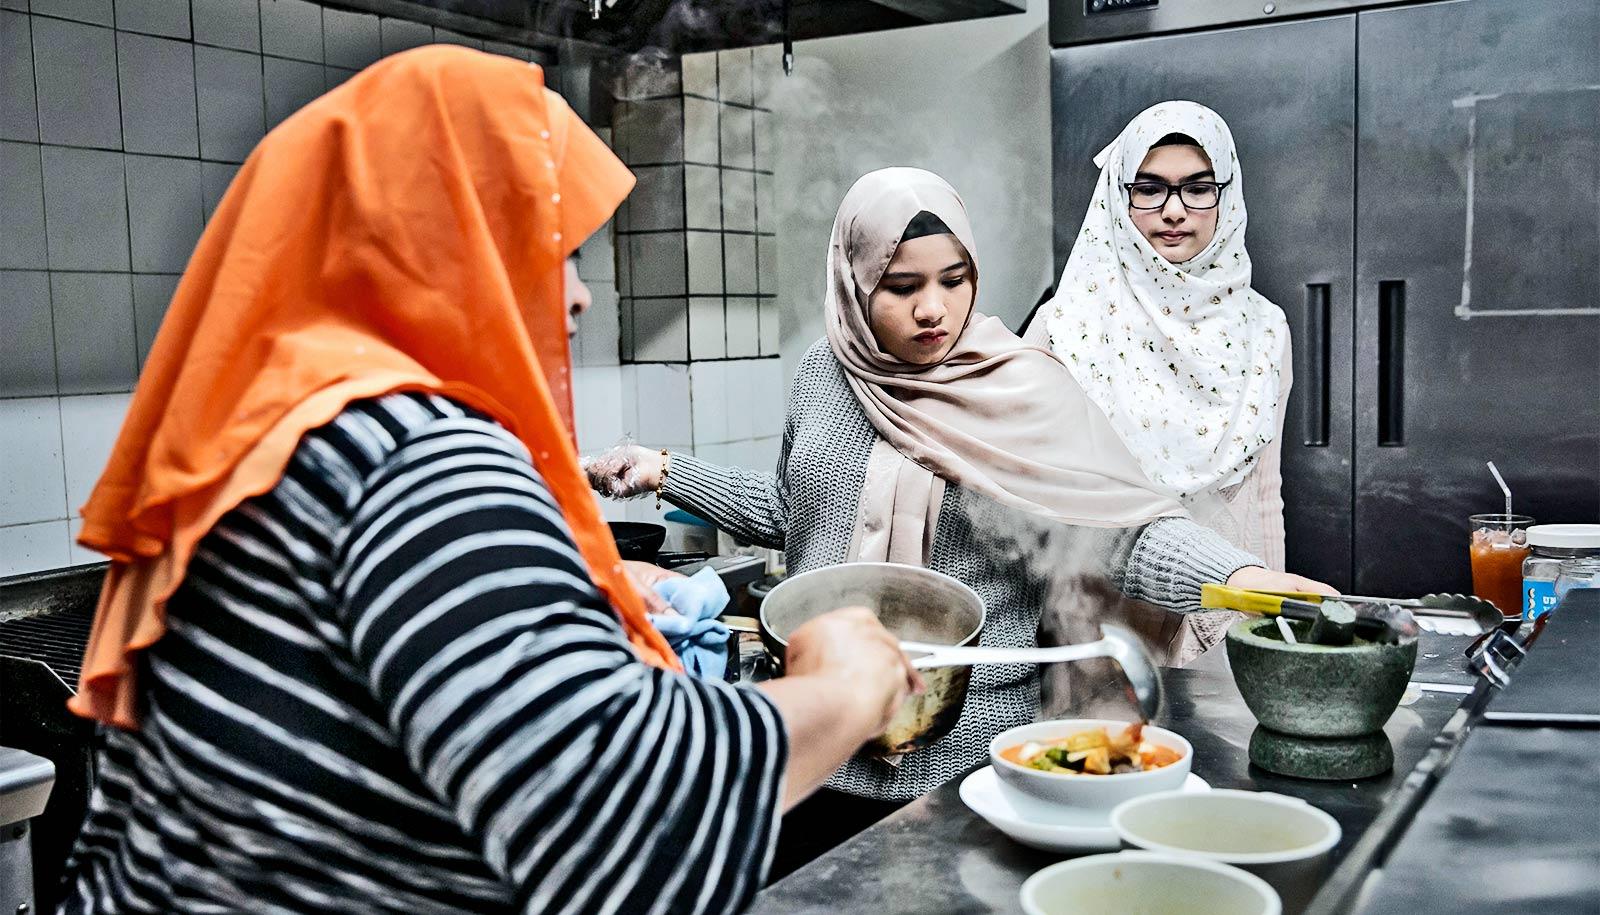 Ethnic communities help new refugees find work